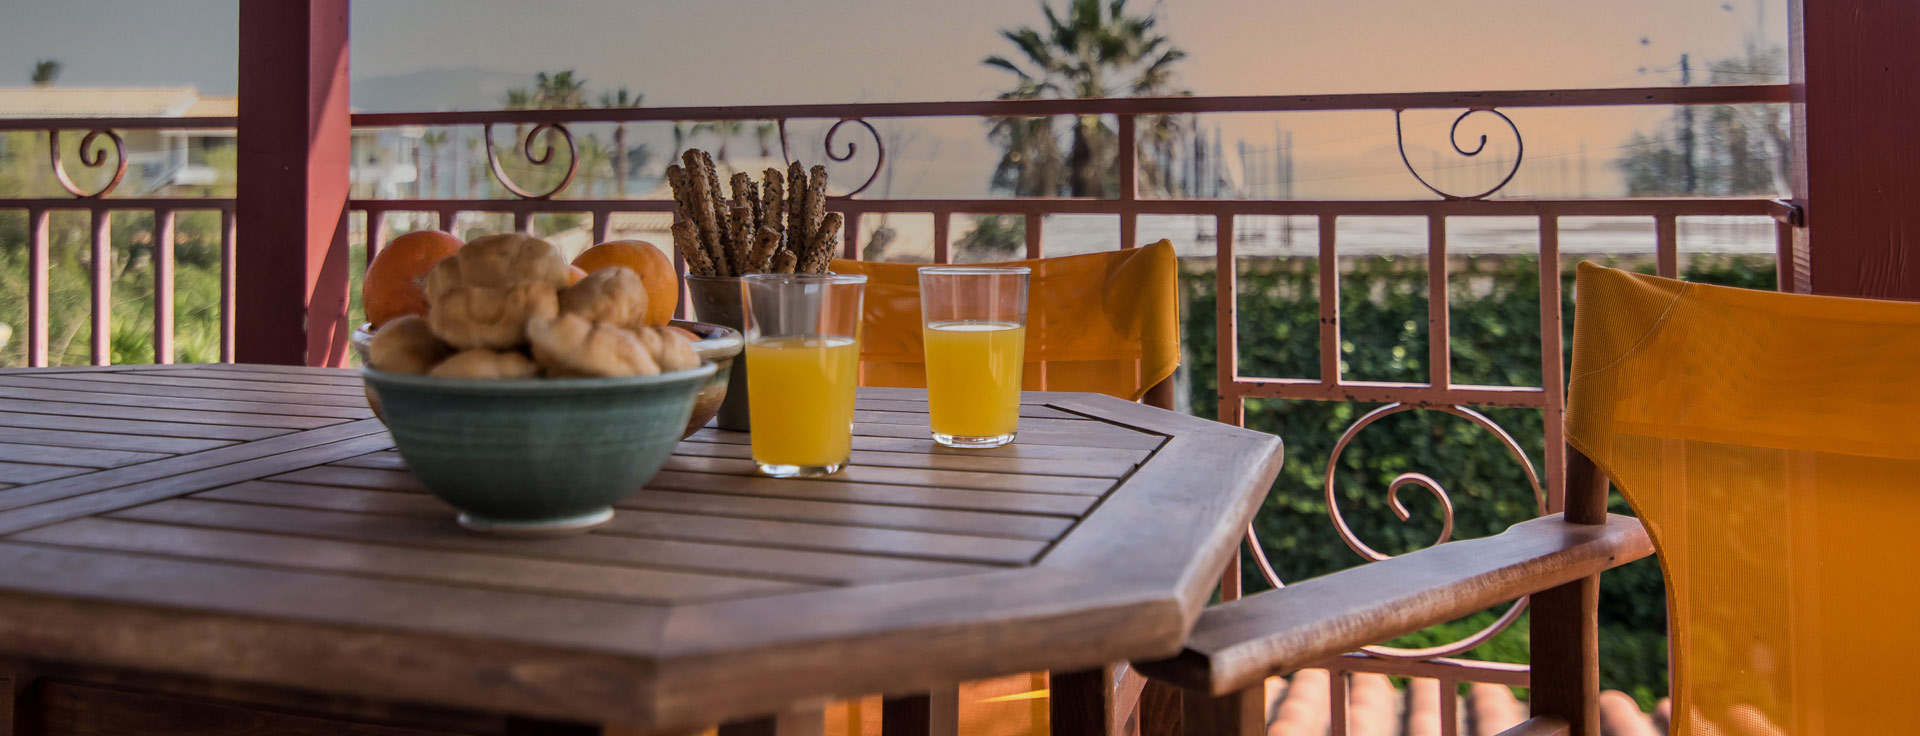 Standard Studio στο Lemonia Accommodations με 3 δωμάτια & βεράντα με θέα τη θάλασσα